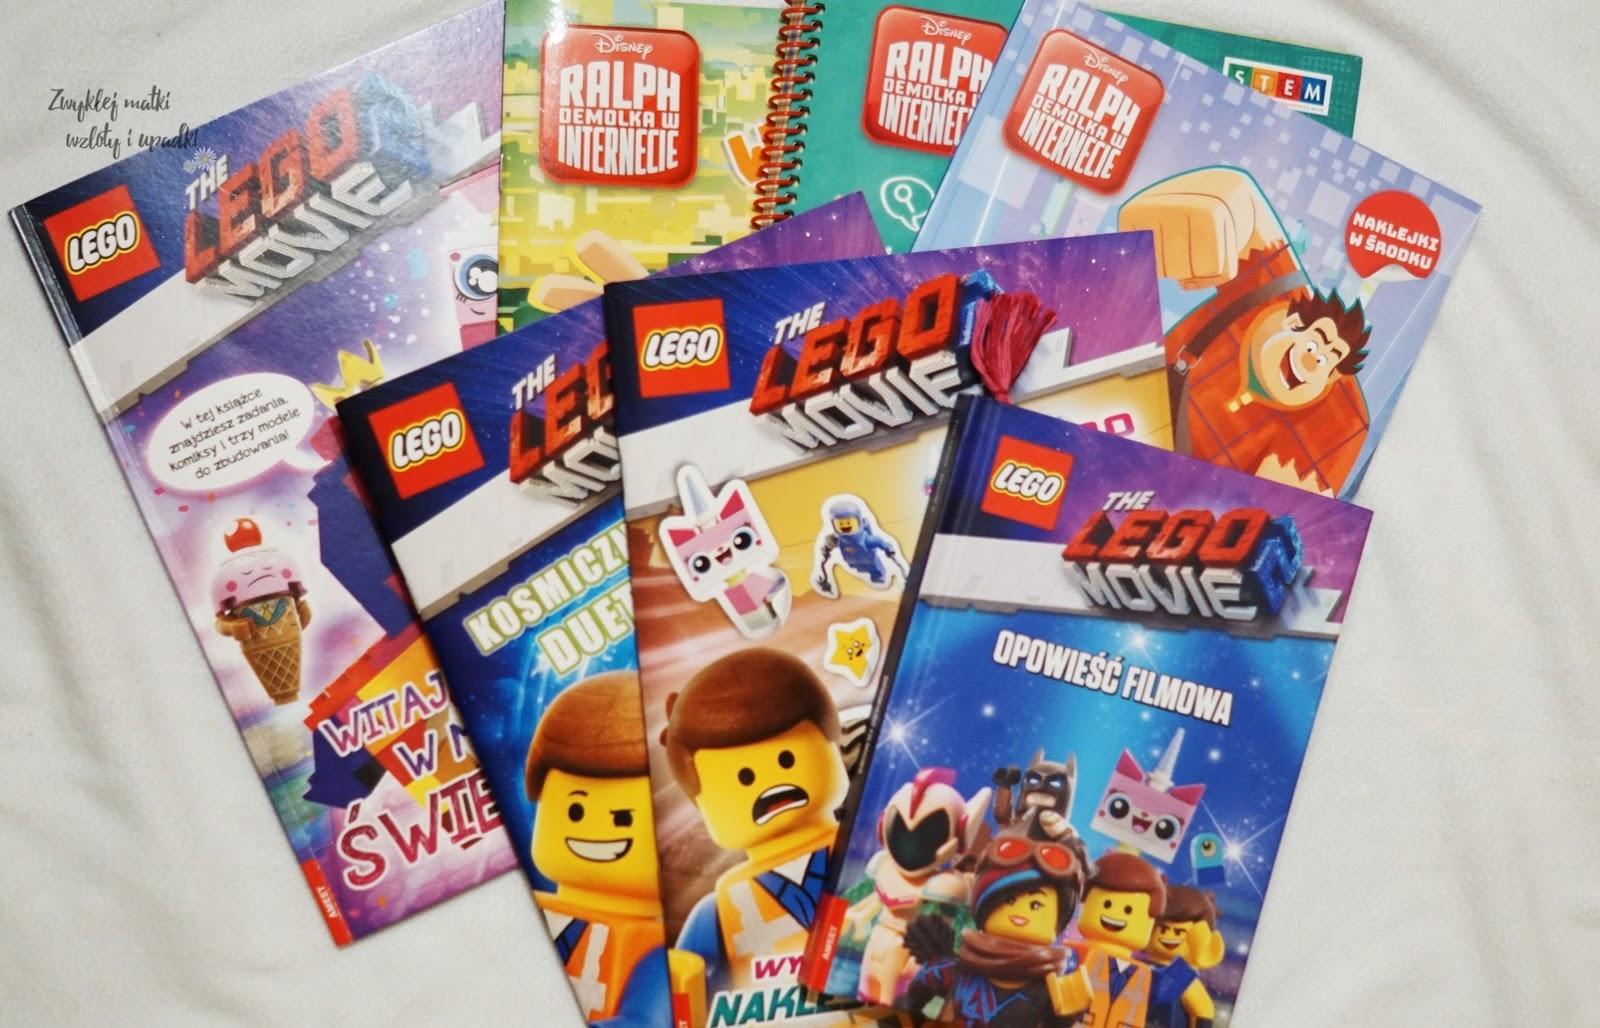 Lego Movie 2 i Ralph Demolka w kinie, a po kinie...